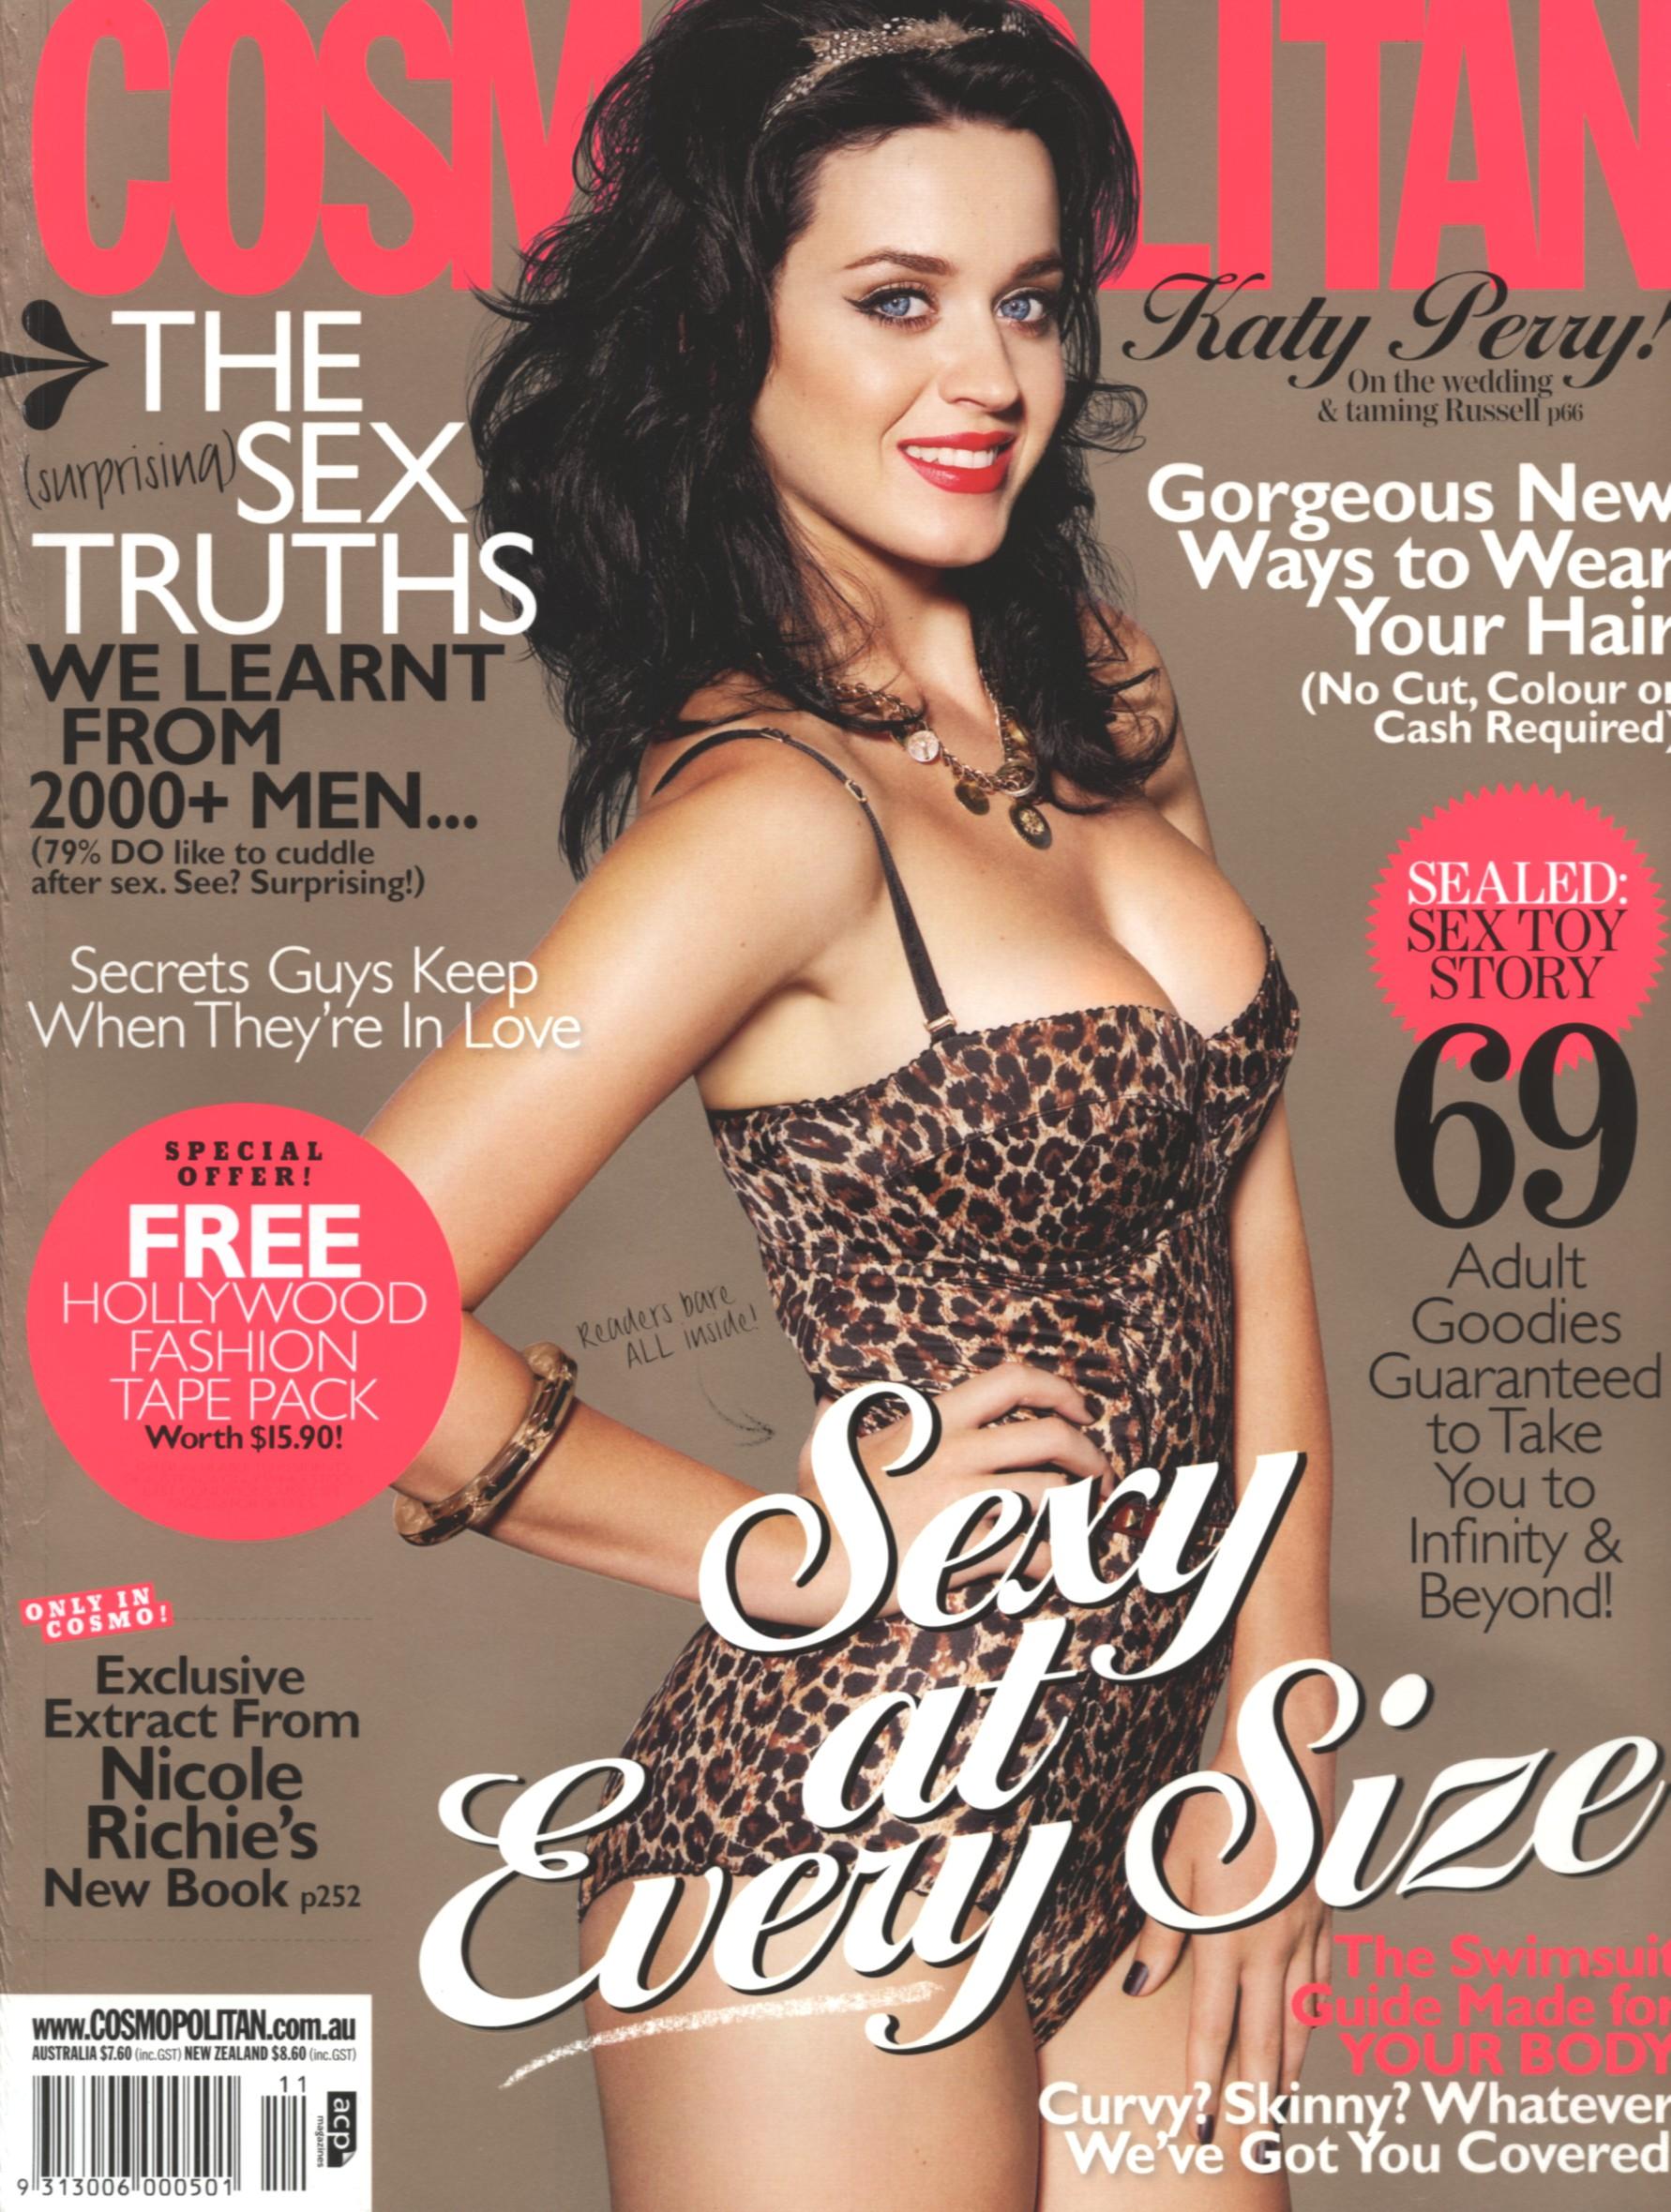 katy-perry-cosmopolitan-magazine-australian-issue-nov-2010-02